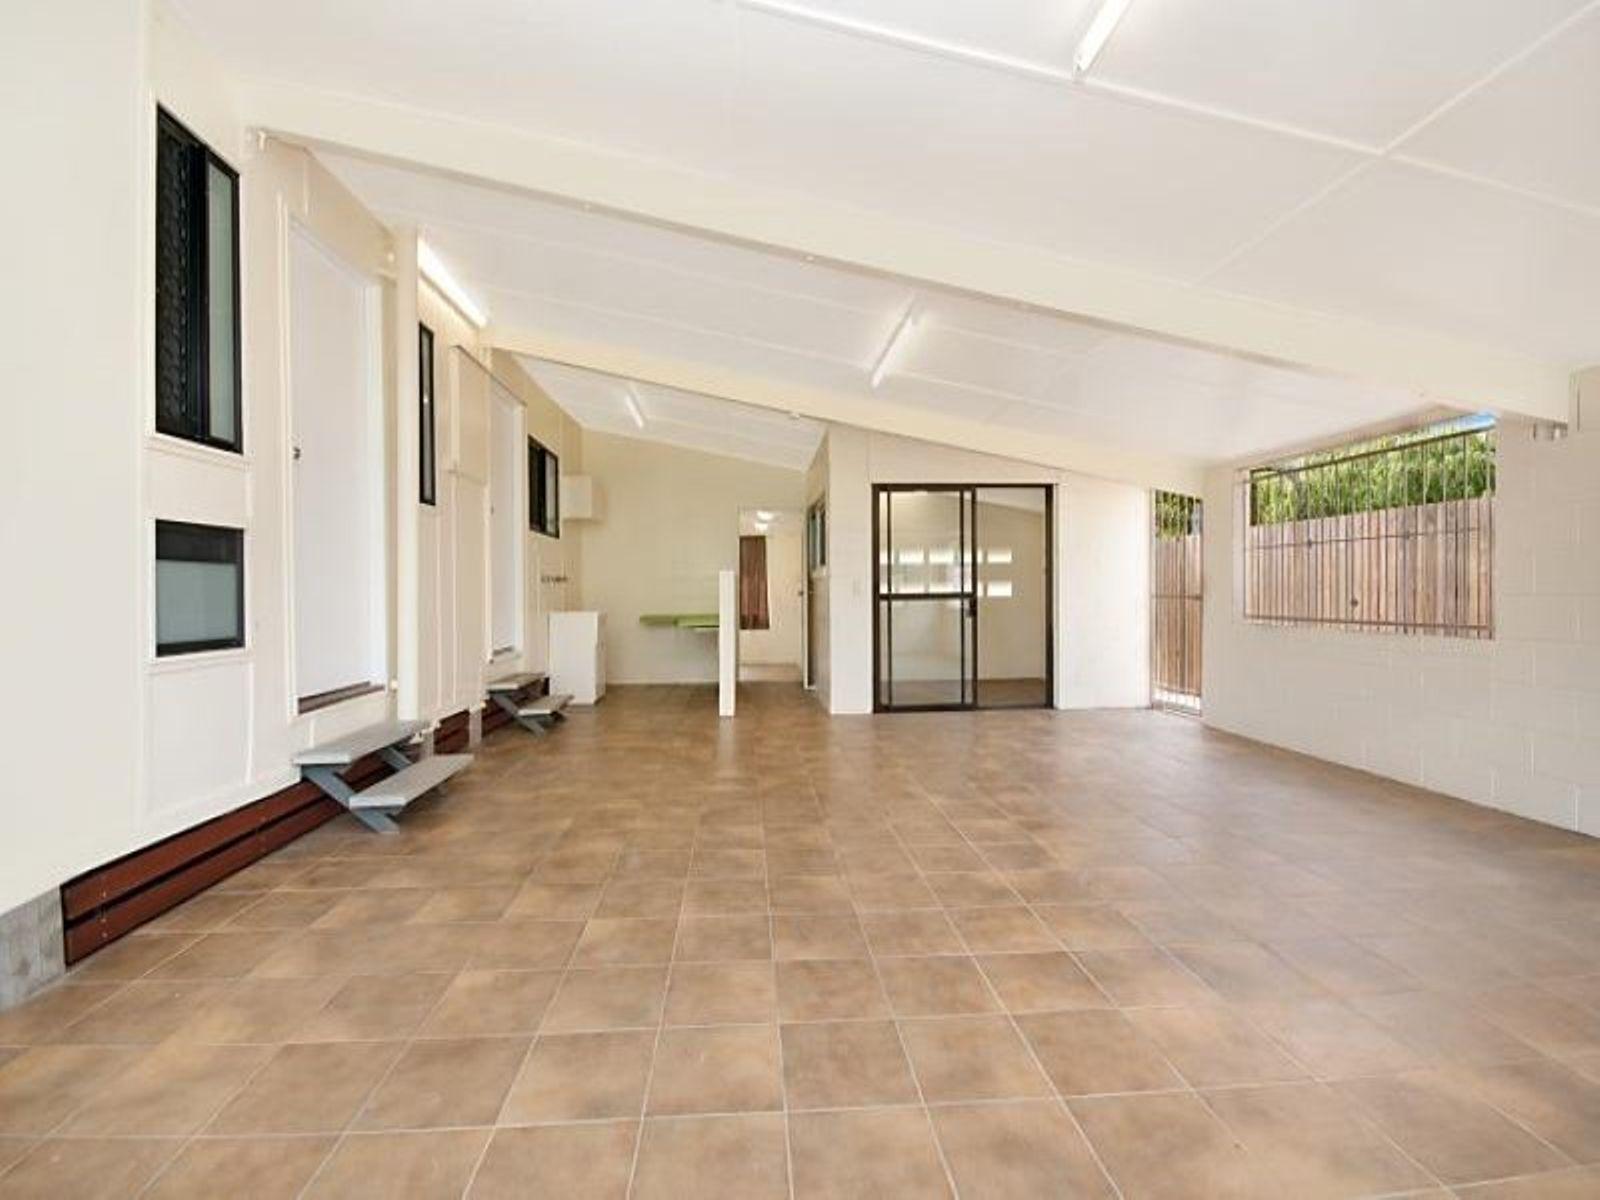 50 Pugh Street, Aitkenvale, QLD 4814